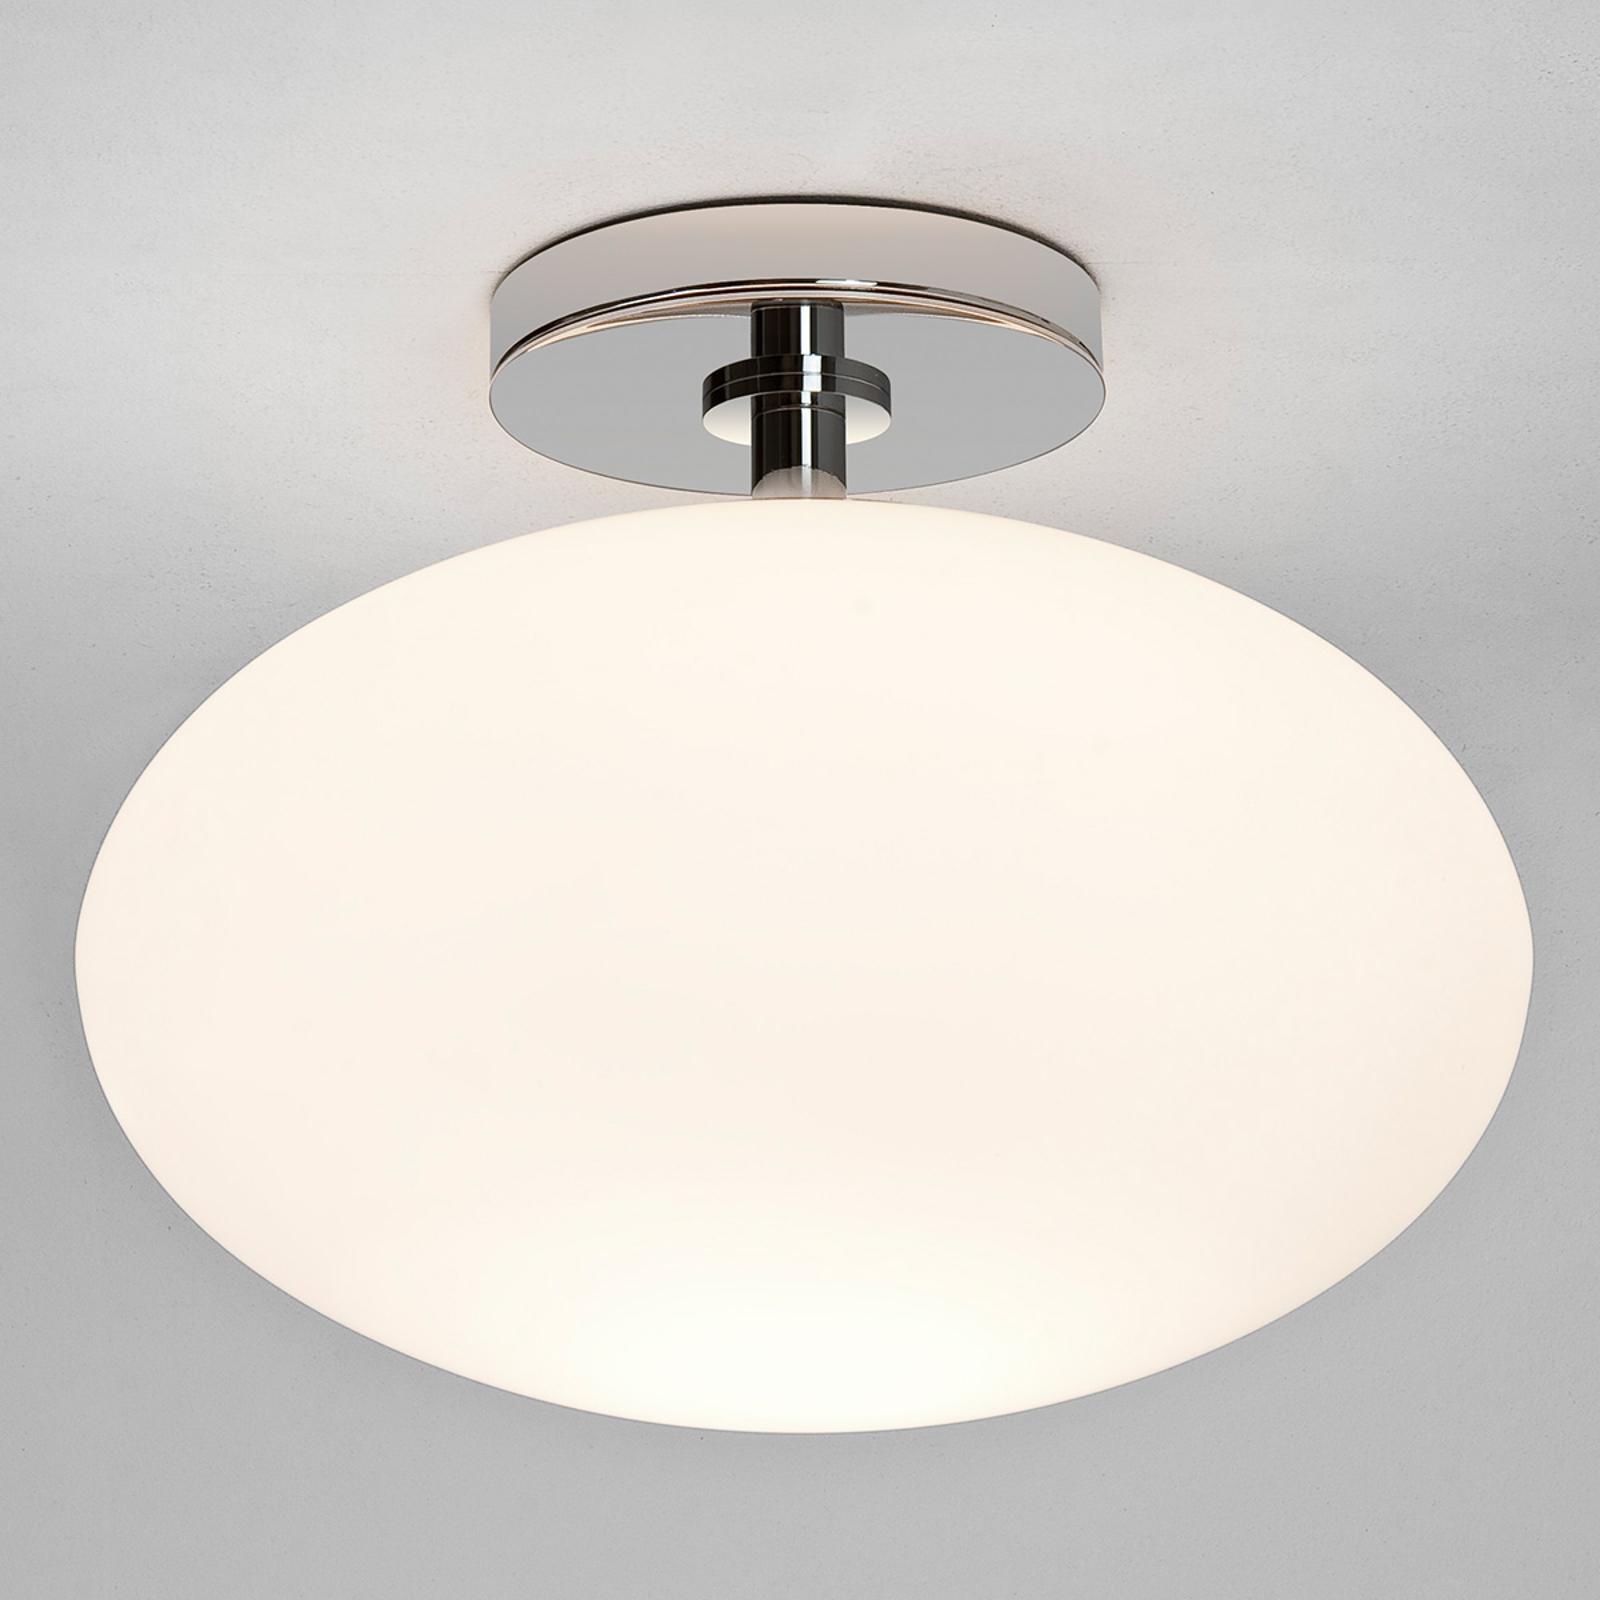 Astro Zeppo – oválne kúpeľňové svietidlo, IP44_1020303_1